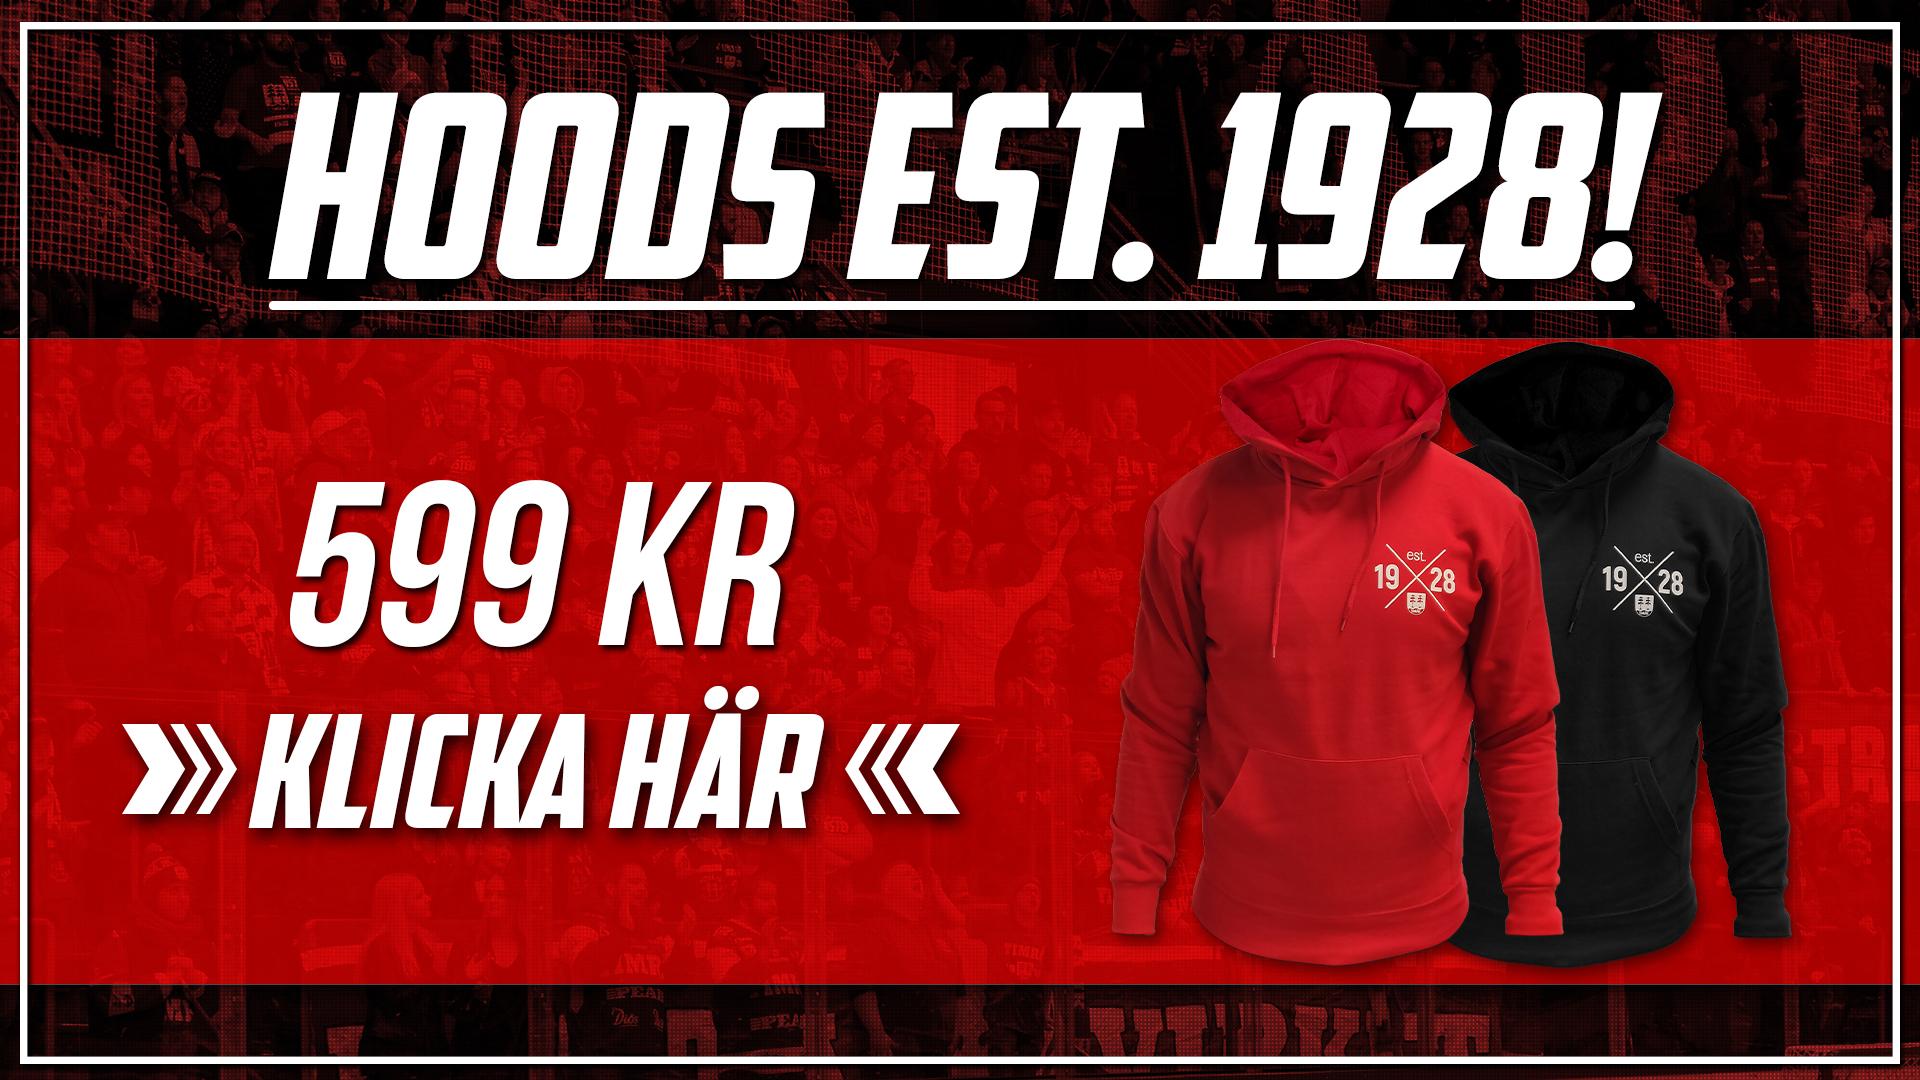 Hoods Est. 1928 webshop